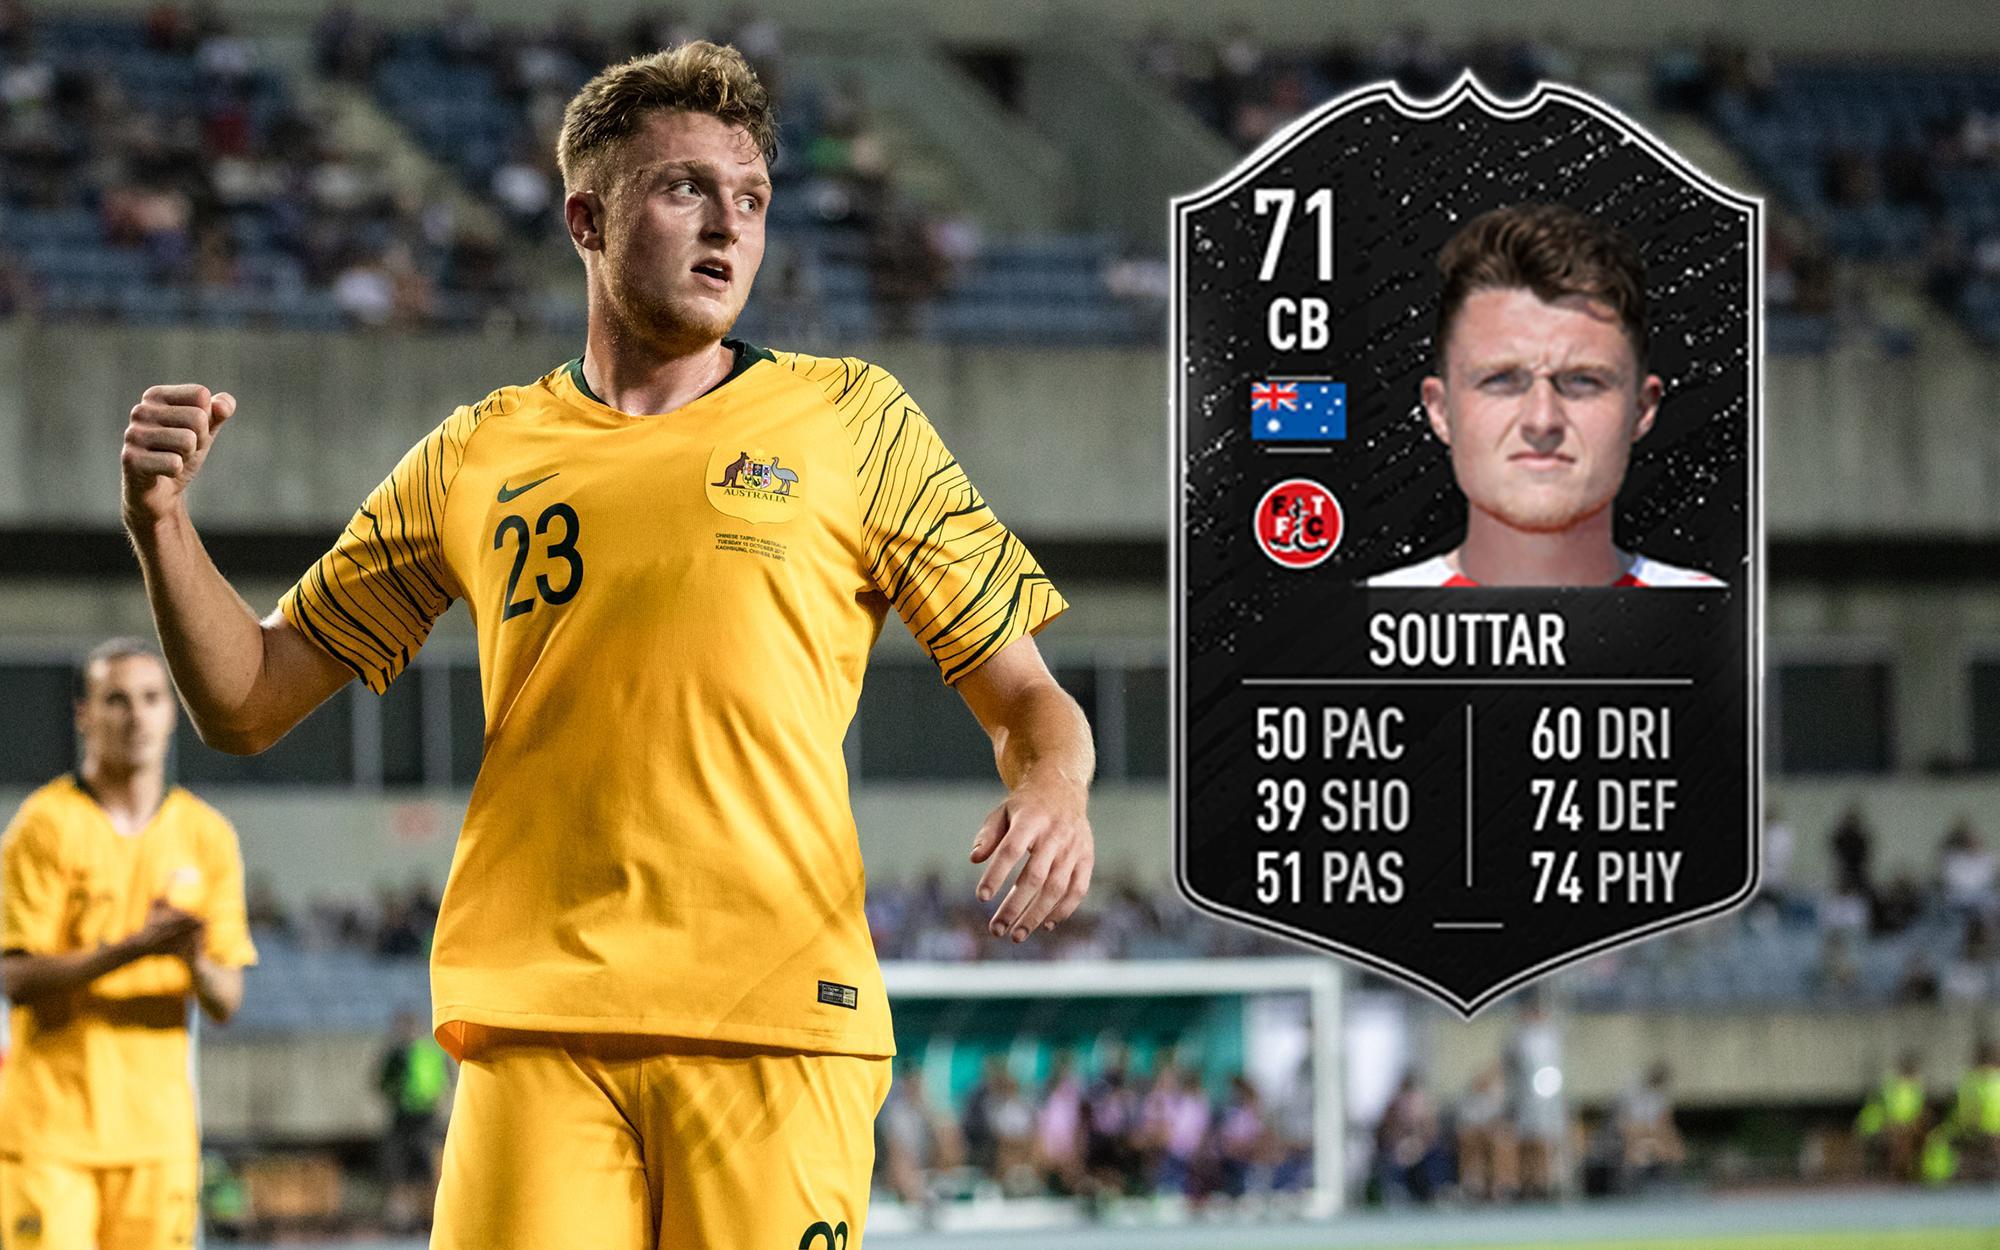 Harry Souttar FIFA 20 Team of the Week